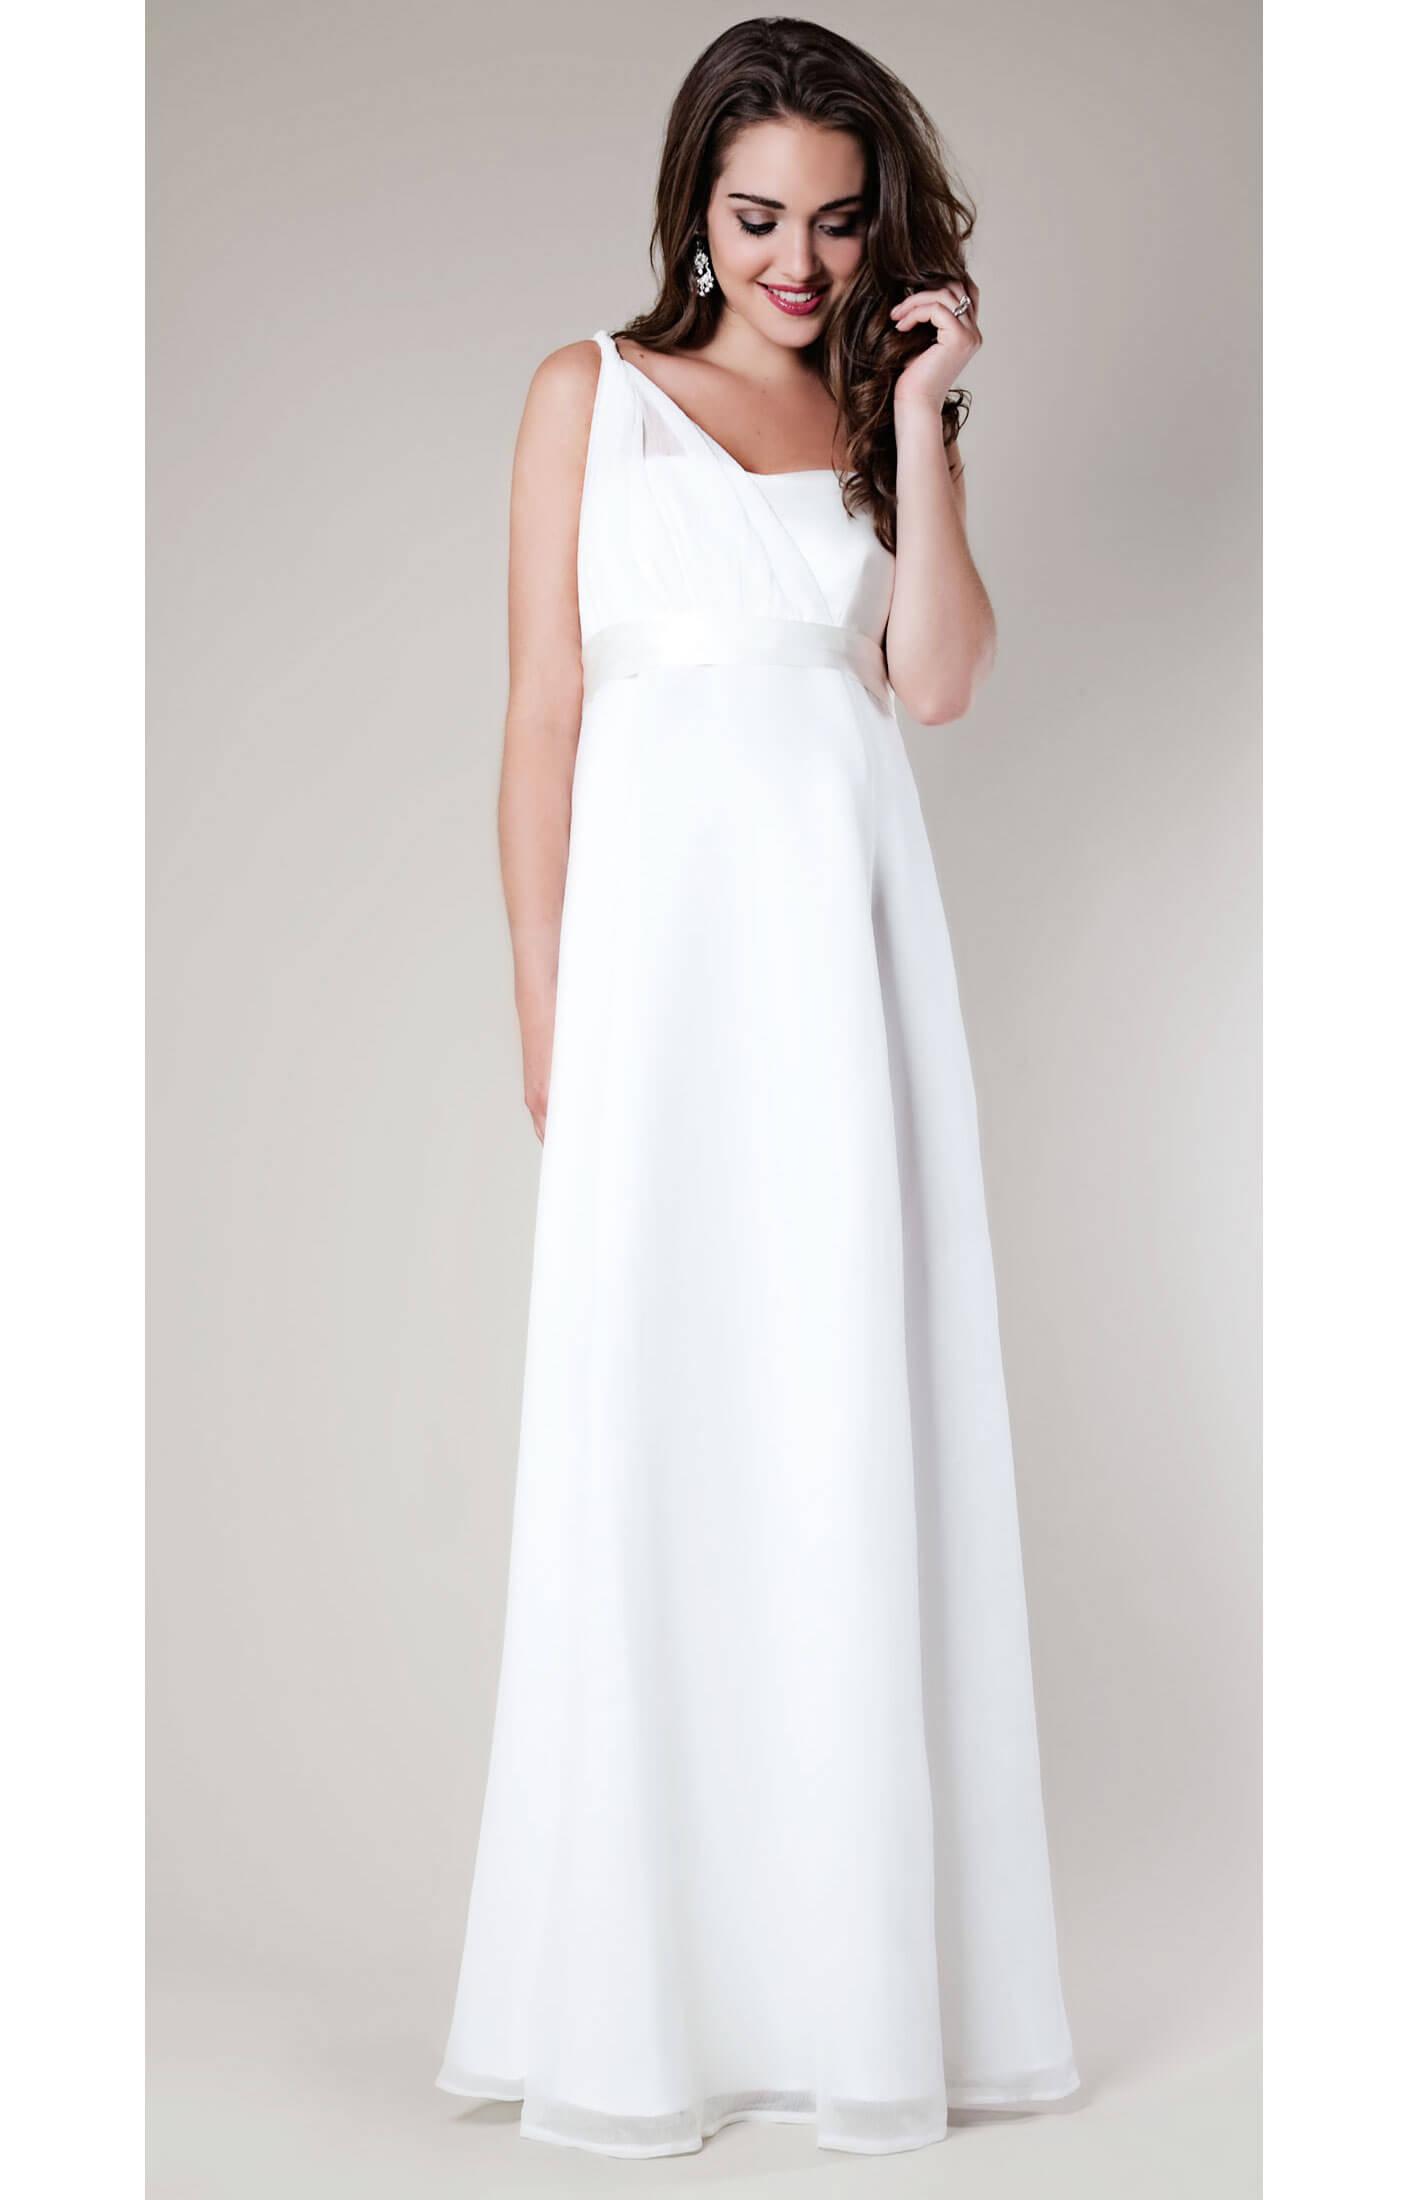 Asymmetrical maternity wedding gown maternity wedding for Shirt dress wedding gown